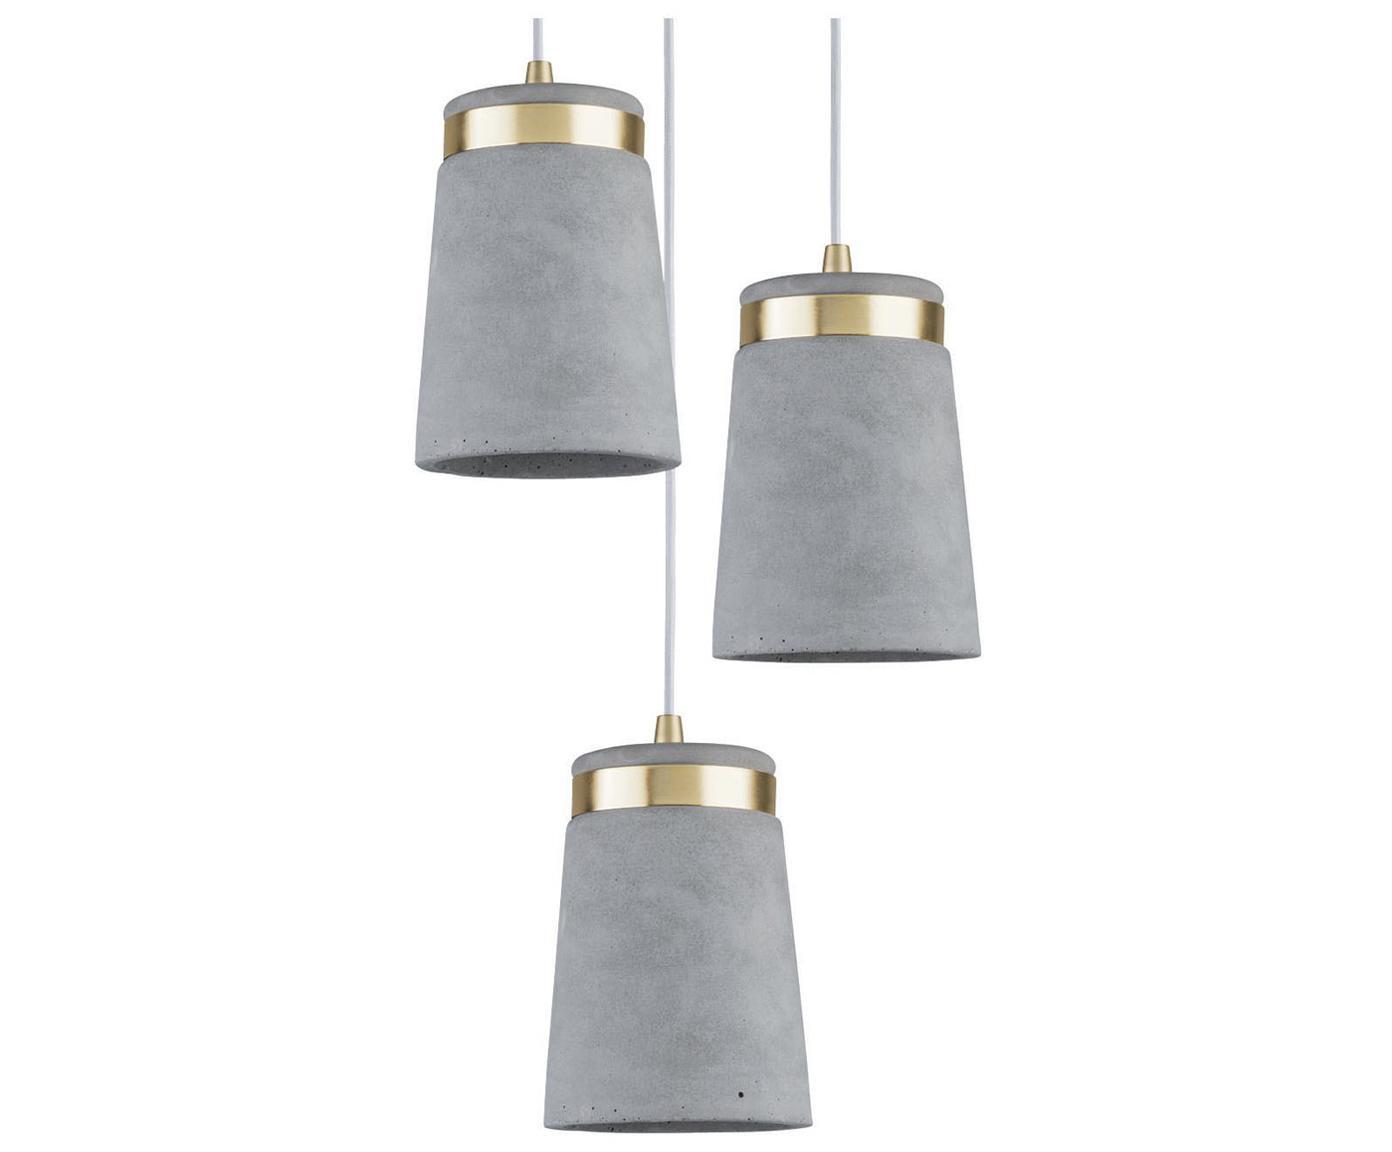 Betonnen hanglamp Norell, Lampenkap: beton, Grijs, messingkleurig, Ø 12 x H 17 cm